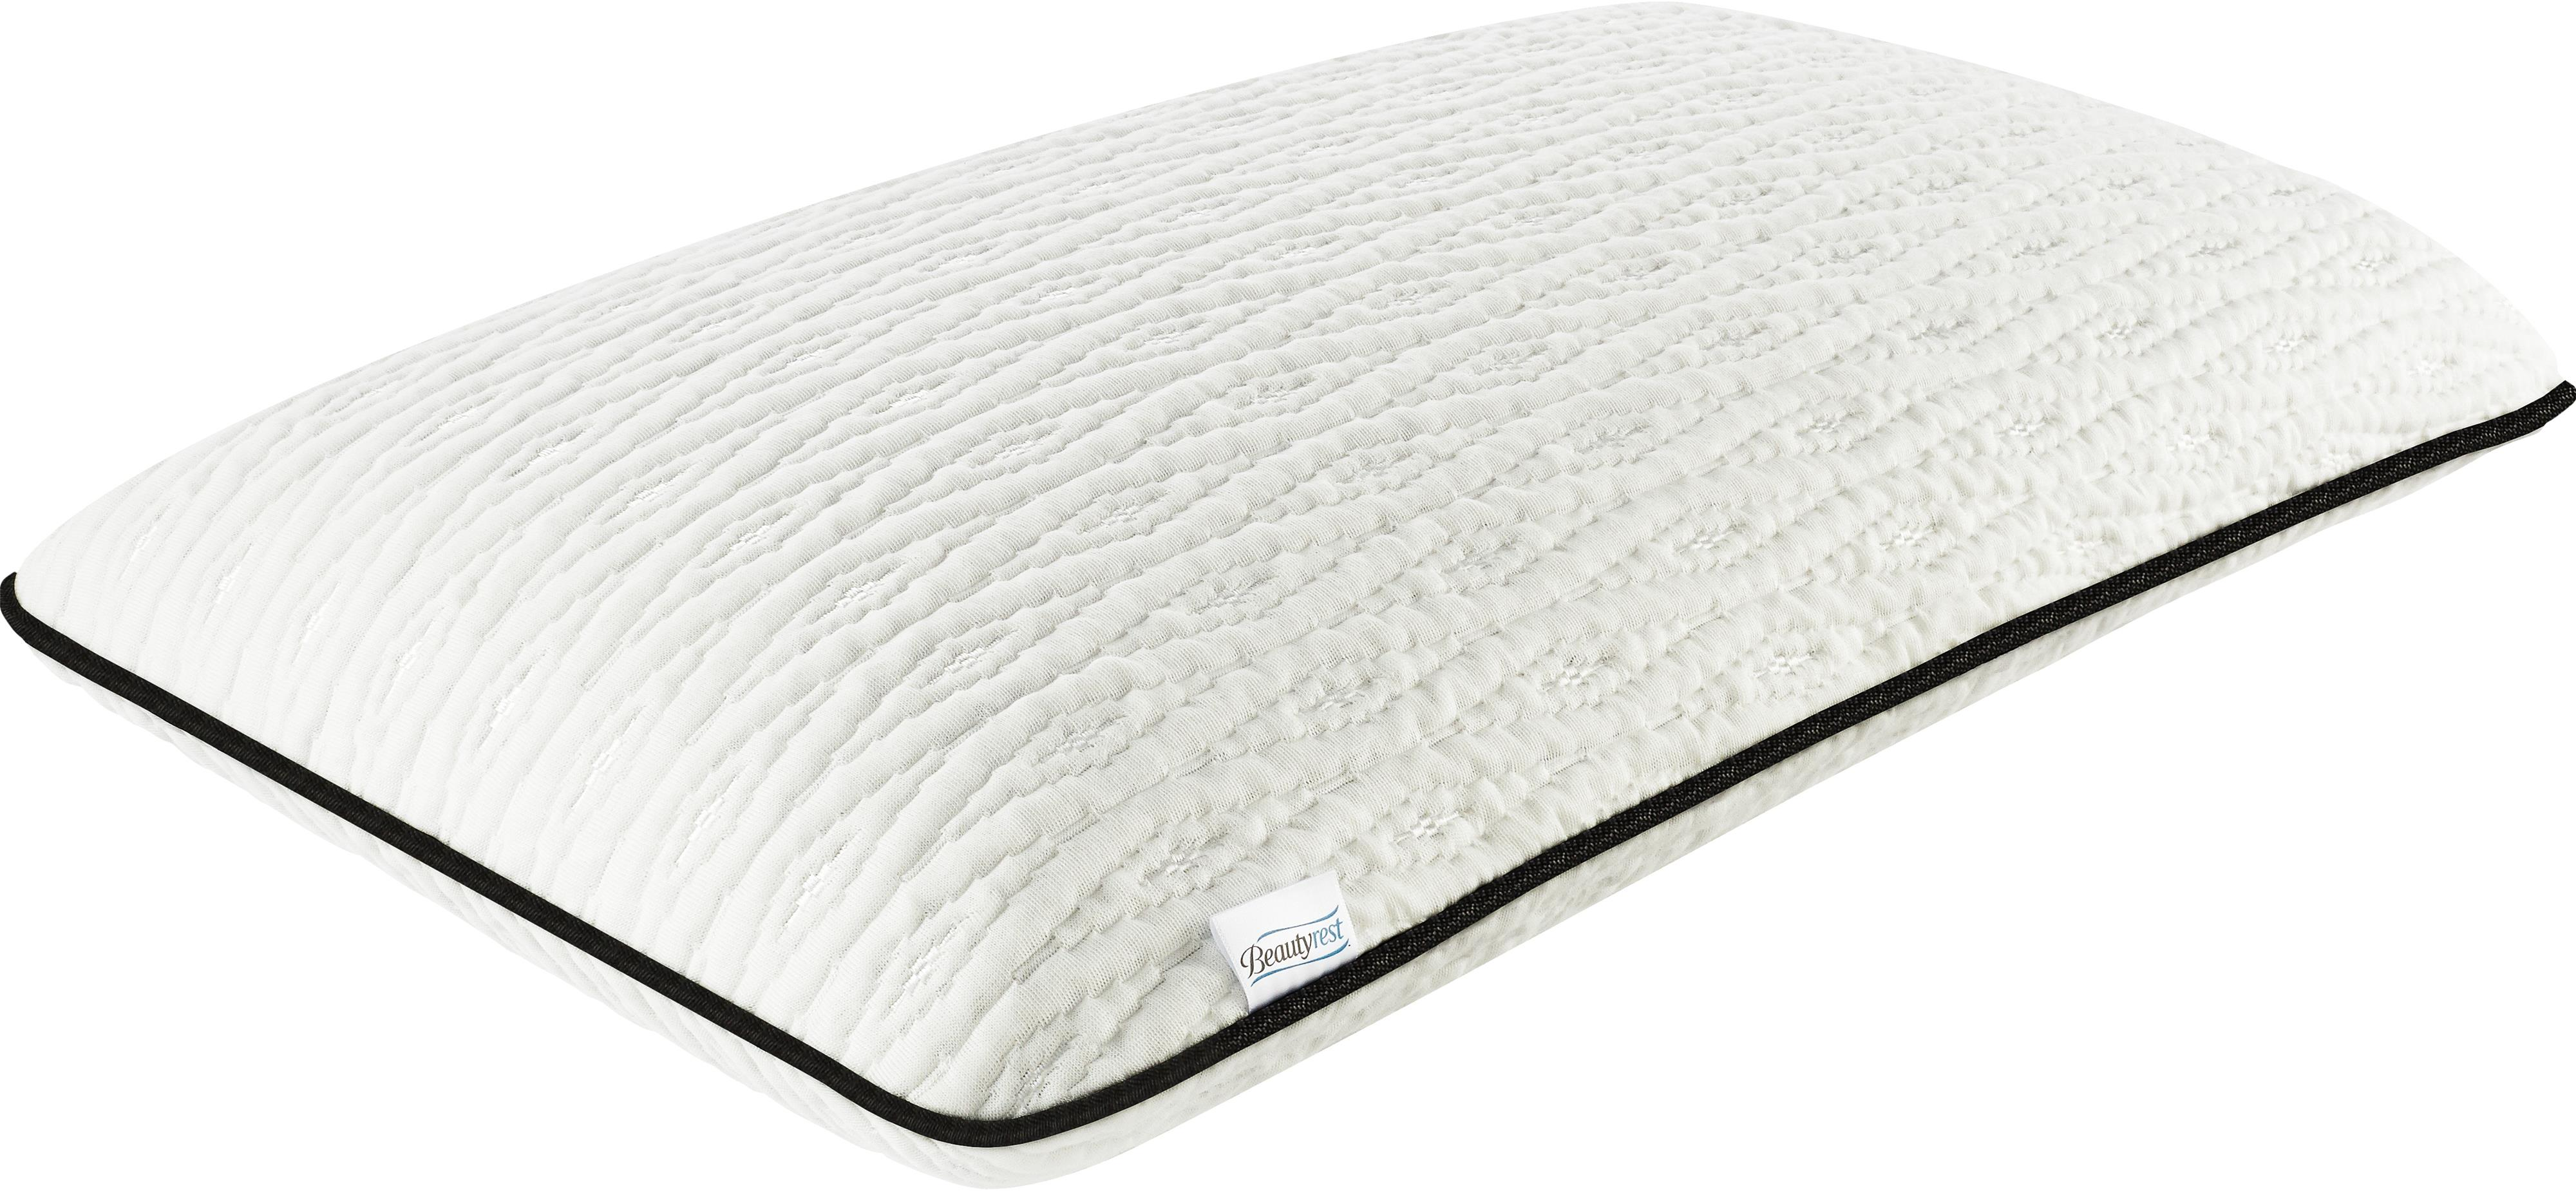 Beautyrest Simmons Pillows Diamond Luxe 5 Quot Aircool 174 Max